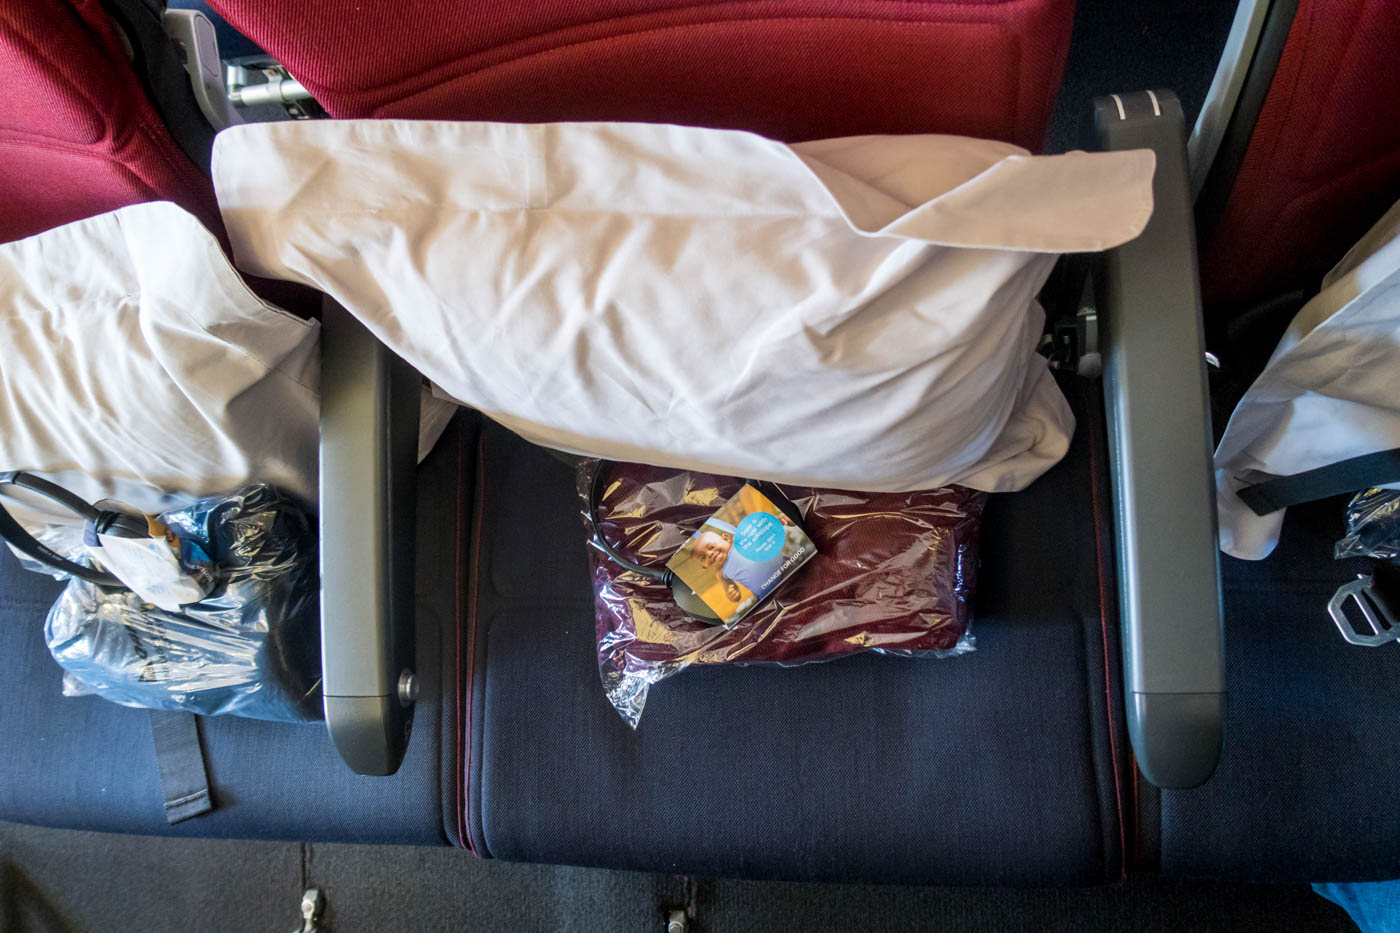 Qantas Headset, Pillow, Blanket